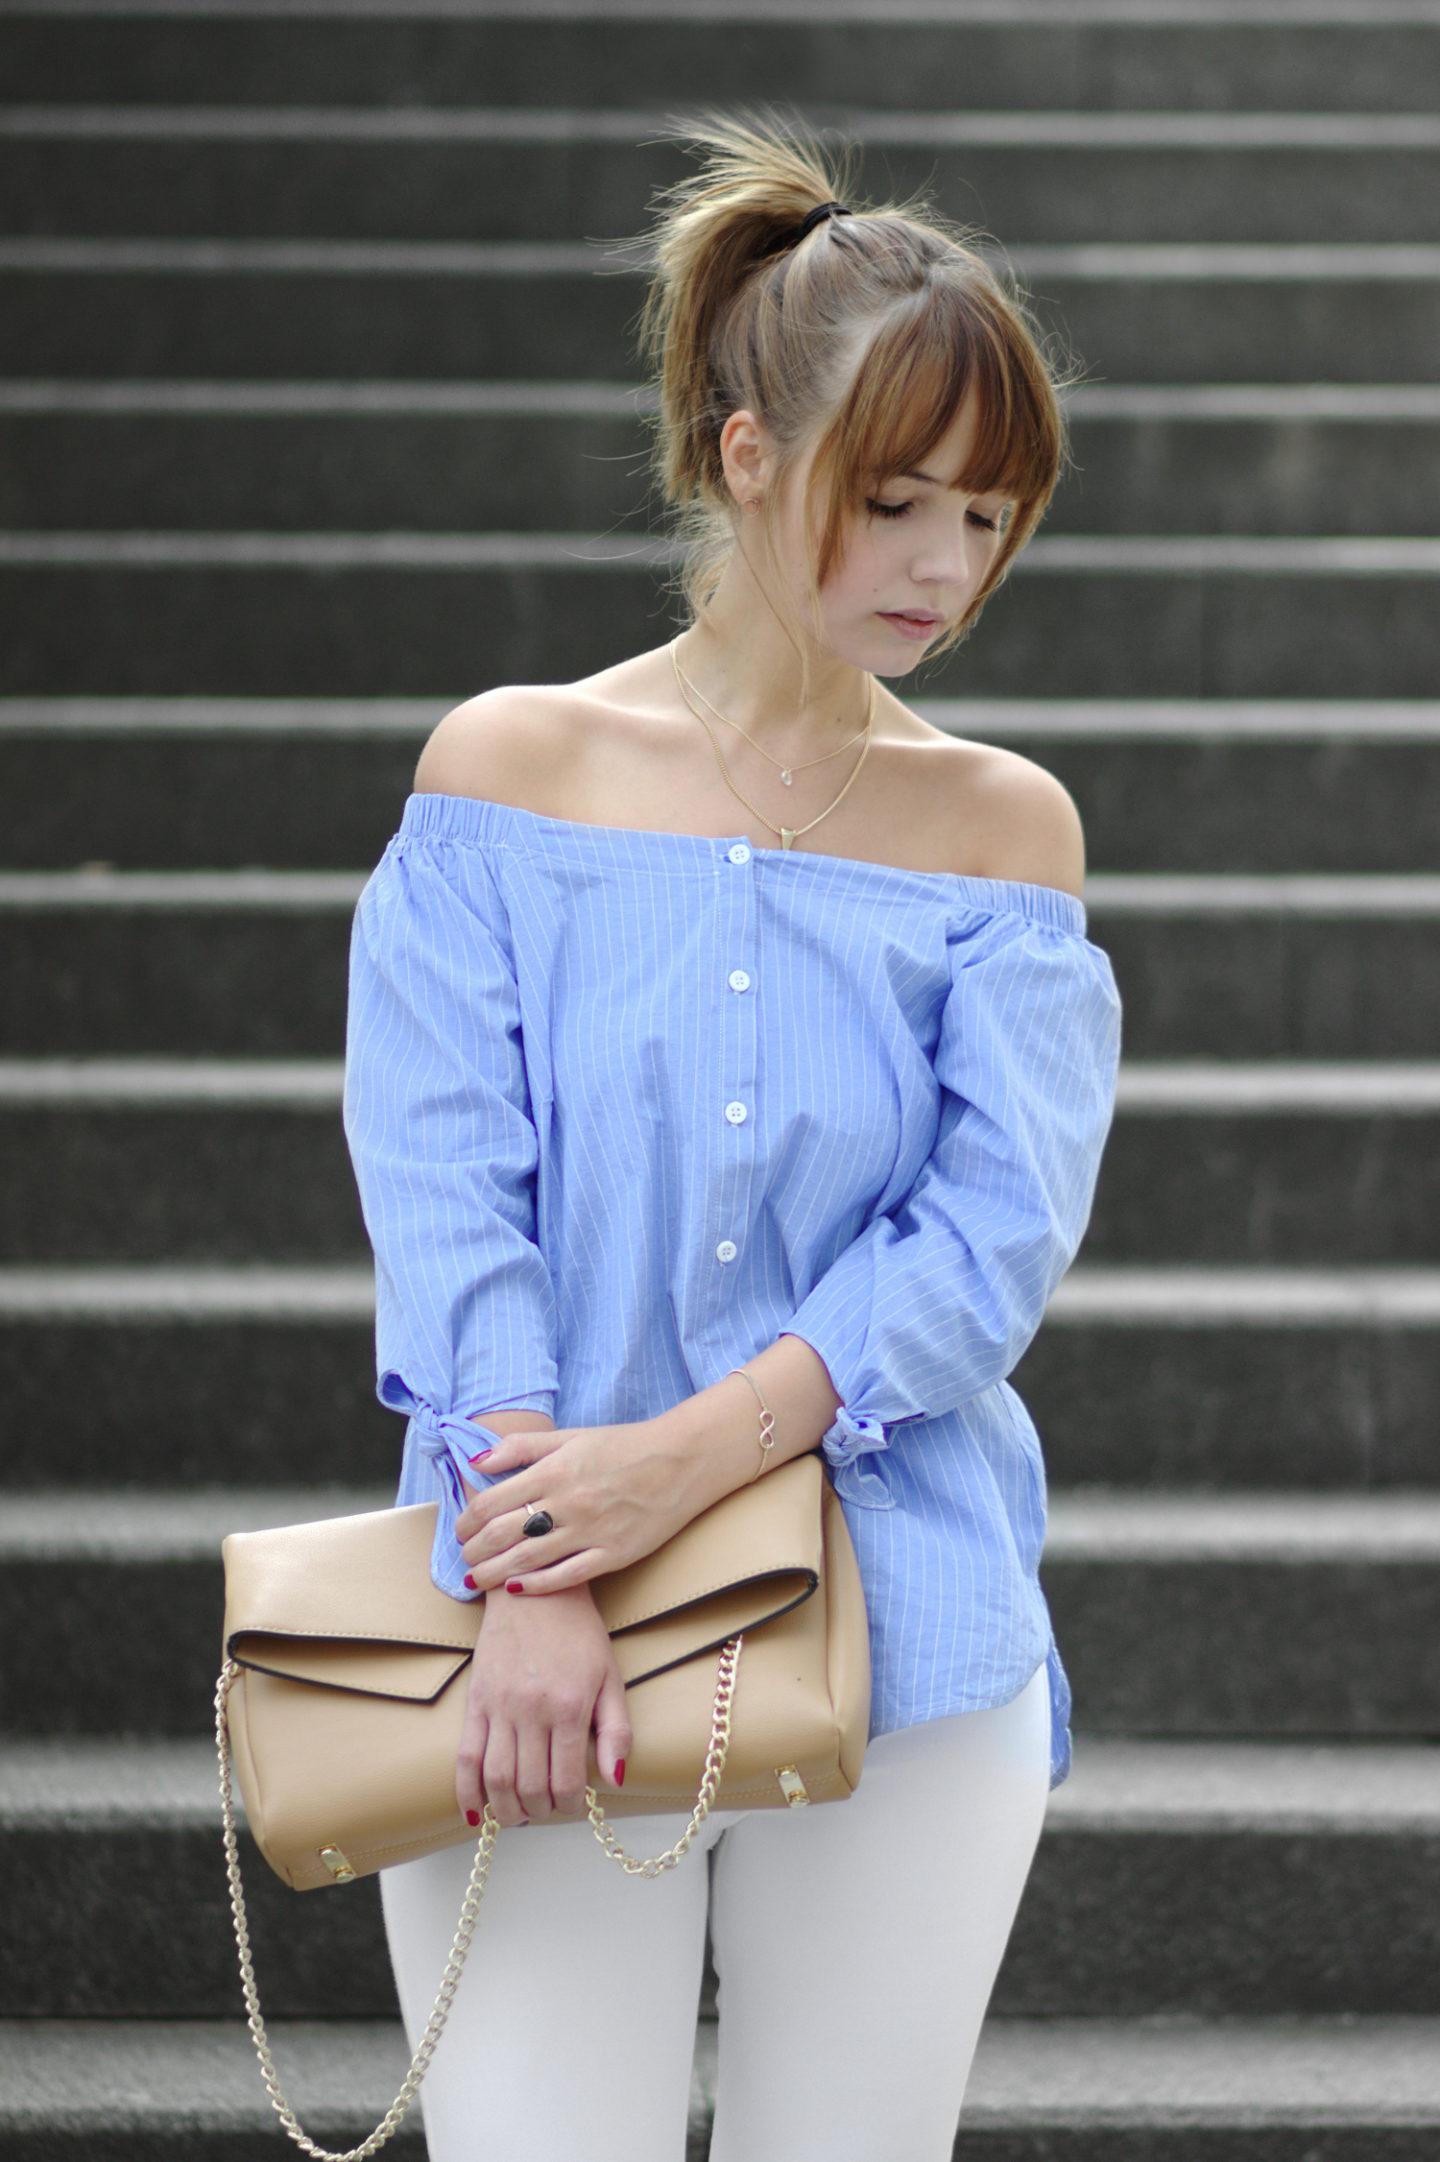 bezauberndenana-fashionblog-outfit-blaue-off-shoulder